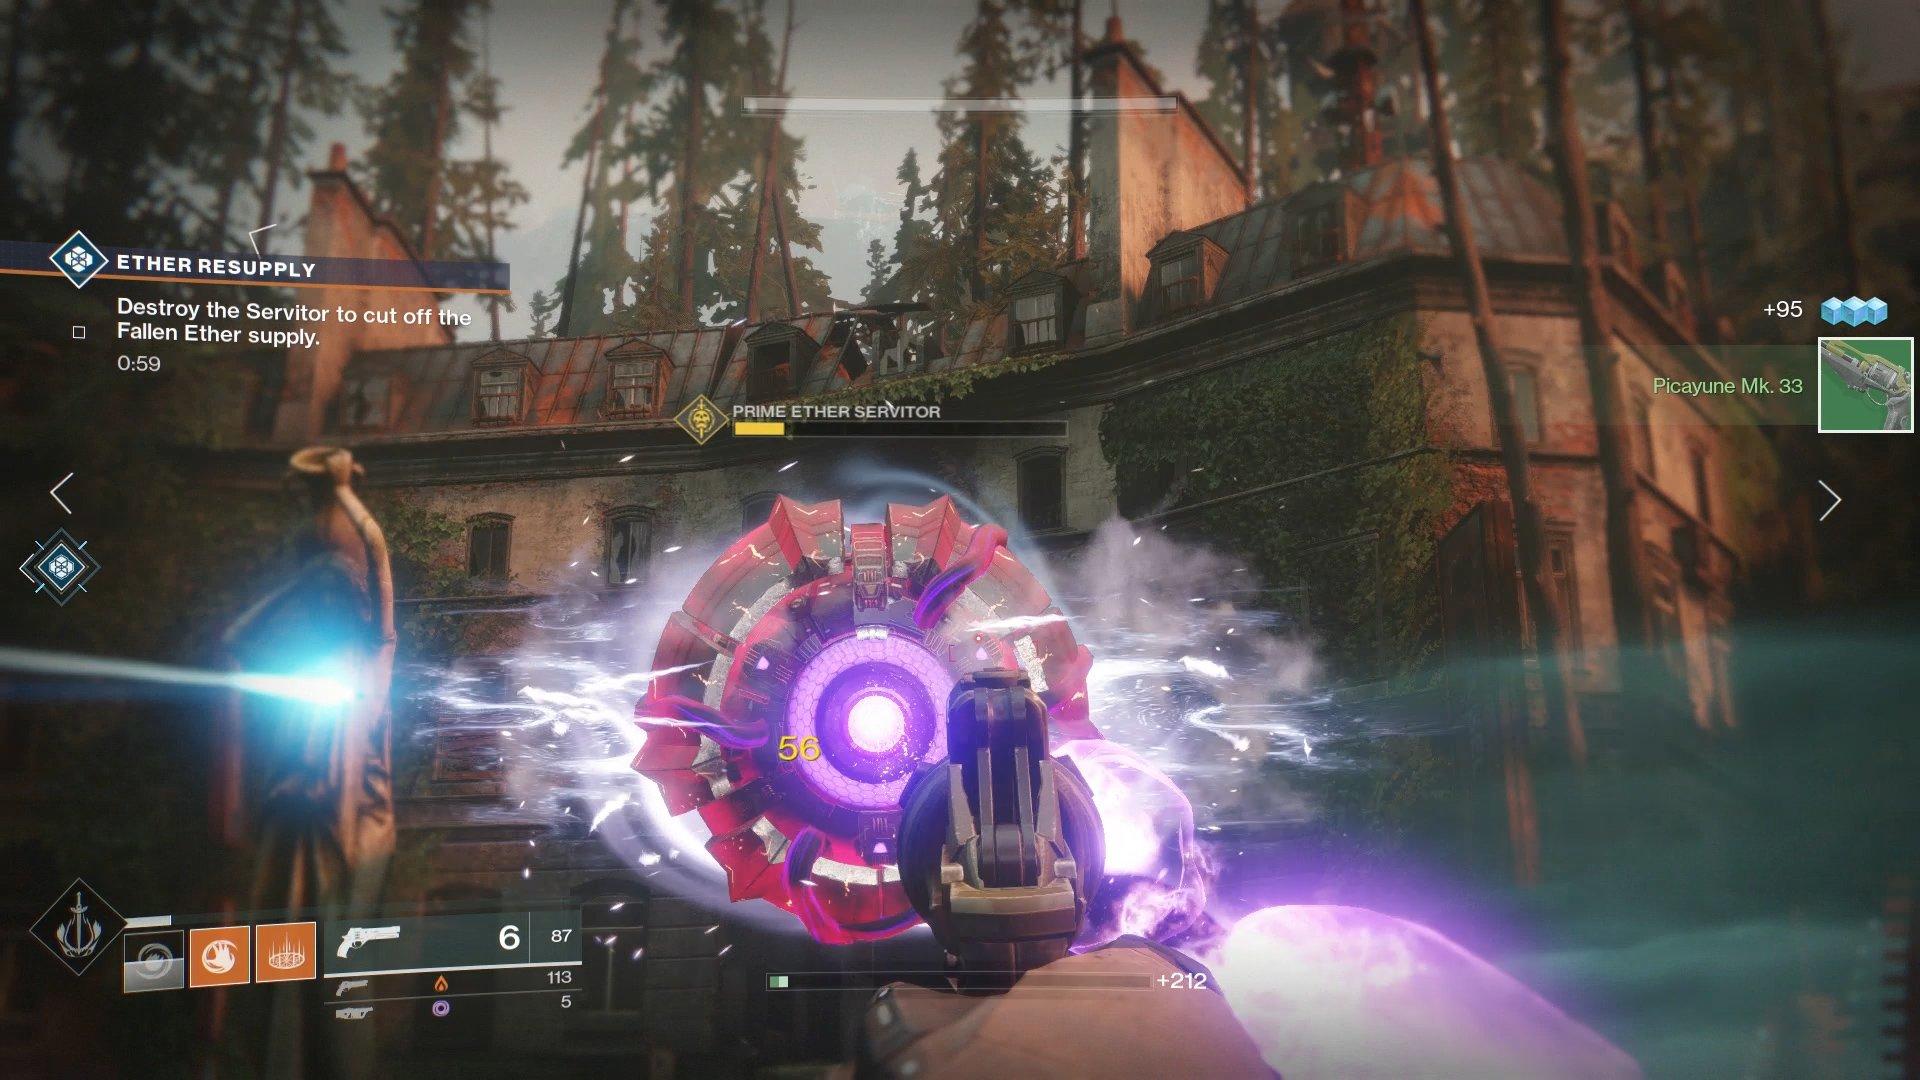 Destiny 2 Ether Resupply public event